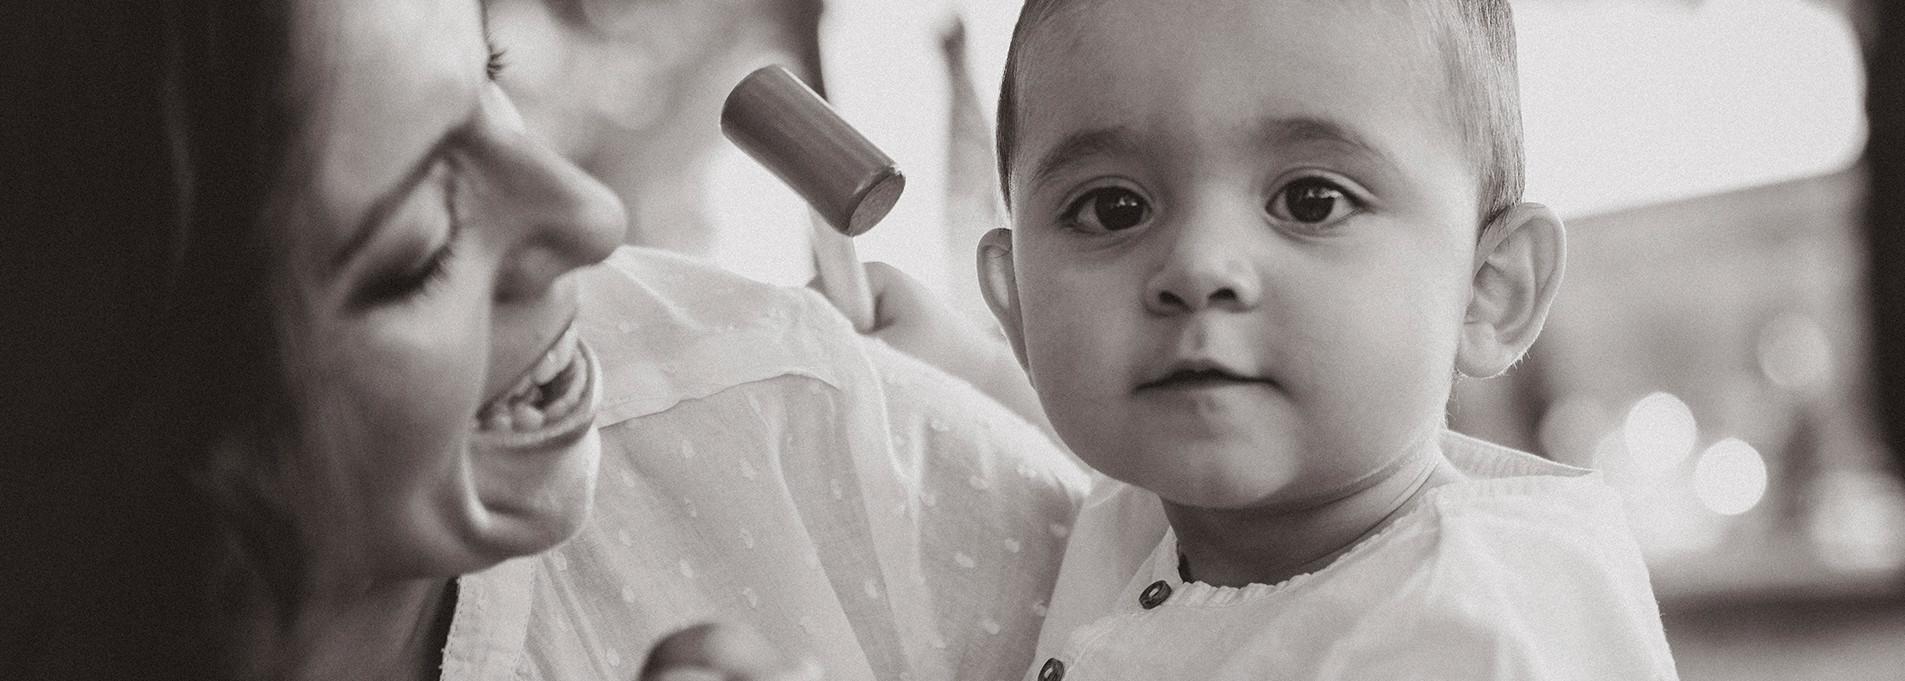 sesiones_fotograficas_infantil_familiar_niños_1_año_merida_badajoz_extremadura_estrella_diaz_photovisual_013